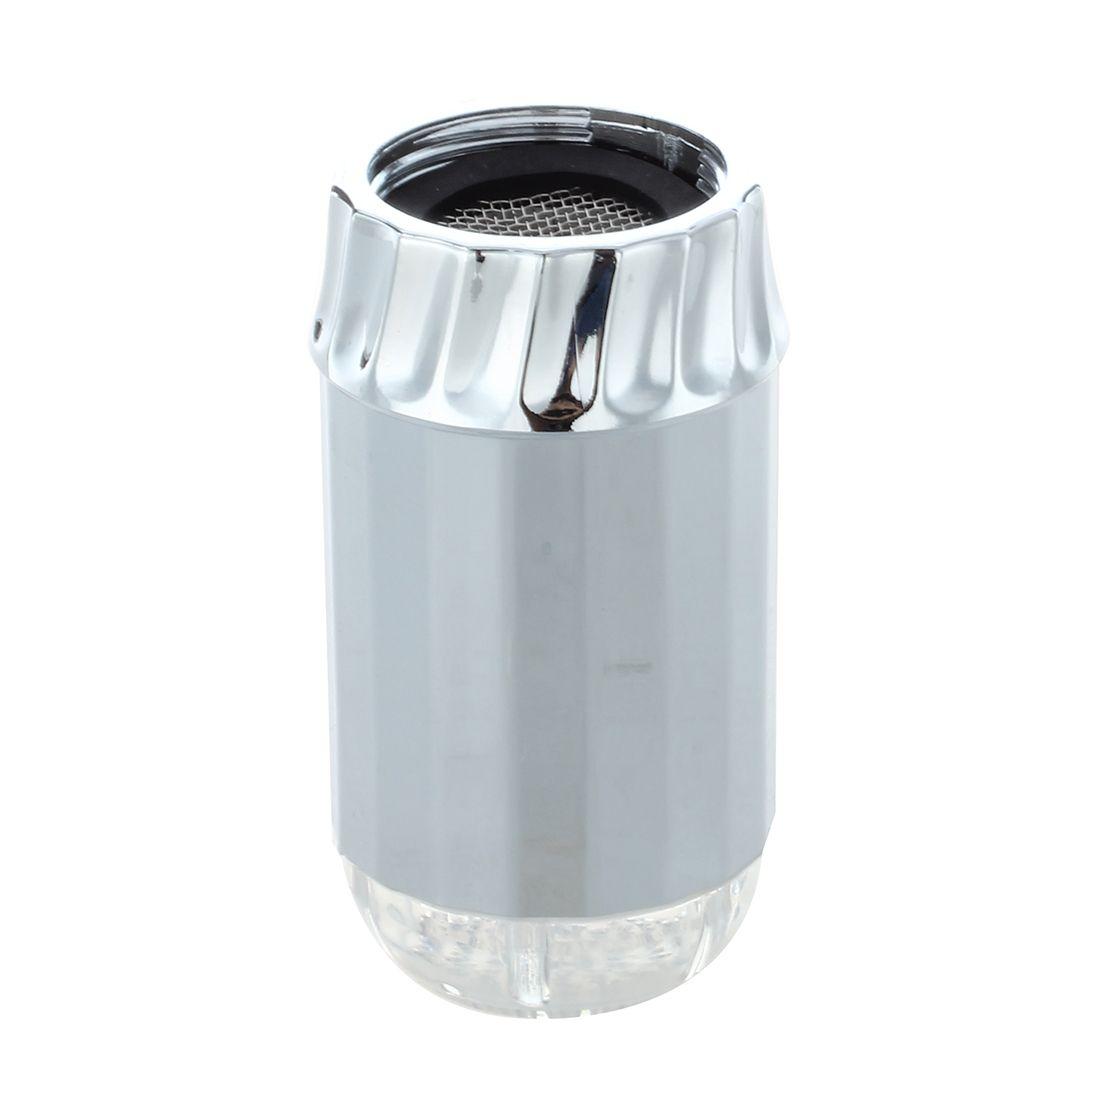 Best Changing Rgb Temperature Sensor Led Kitchen Faucet Sprayer ...